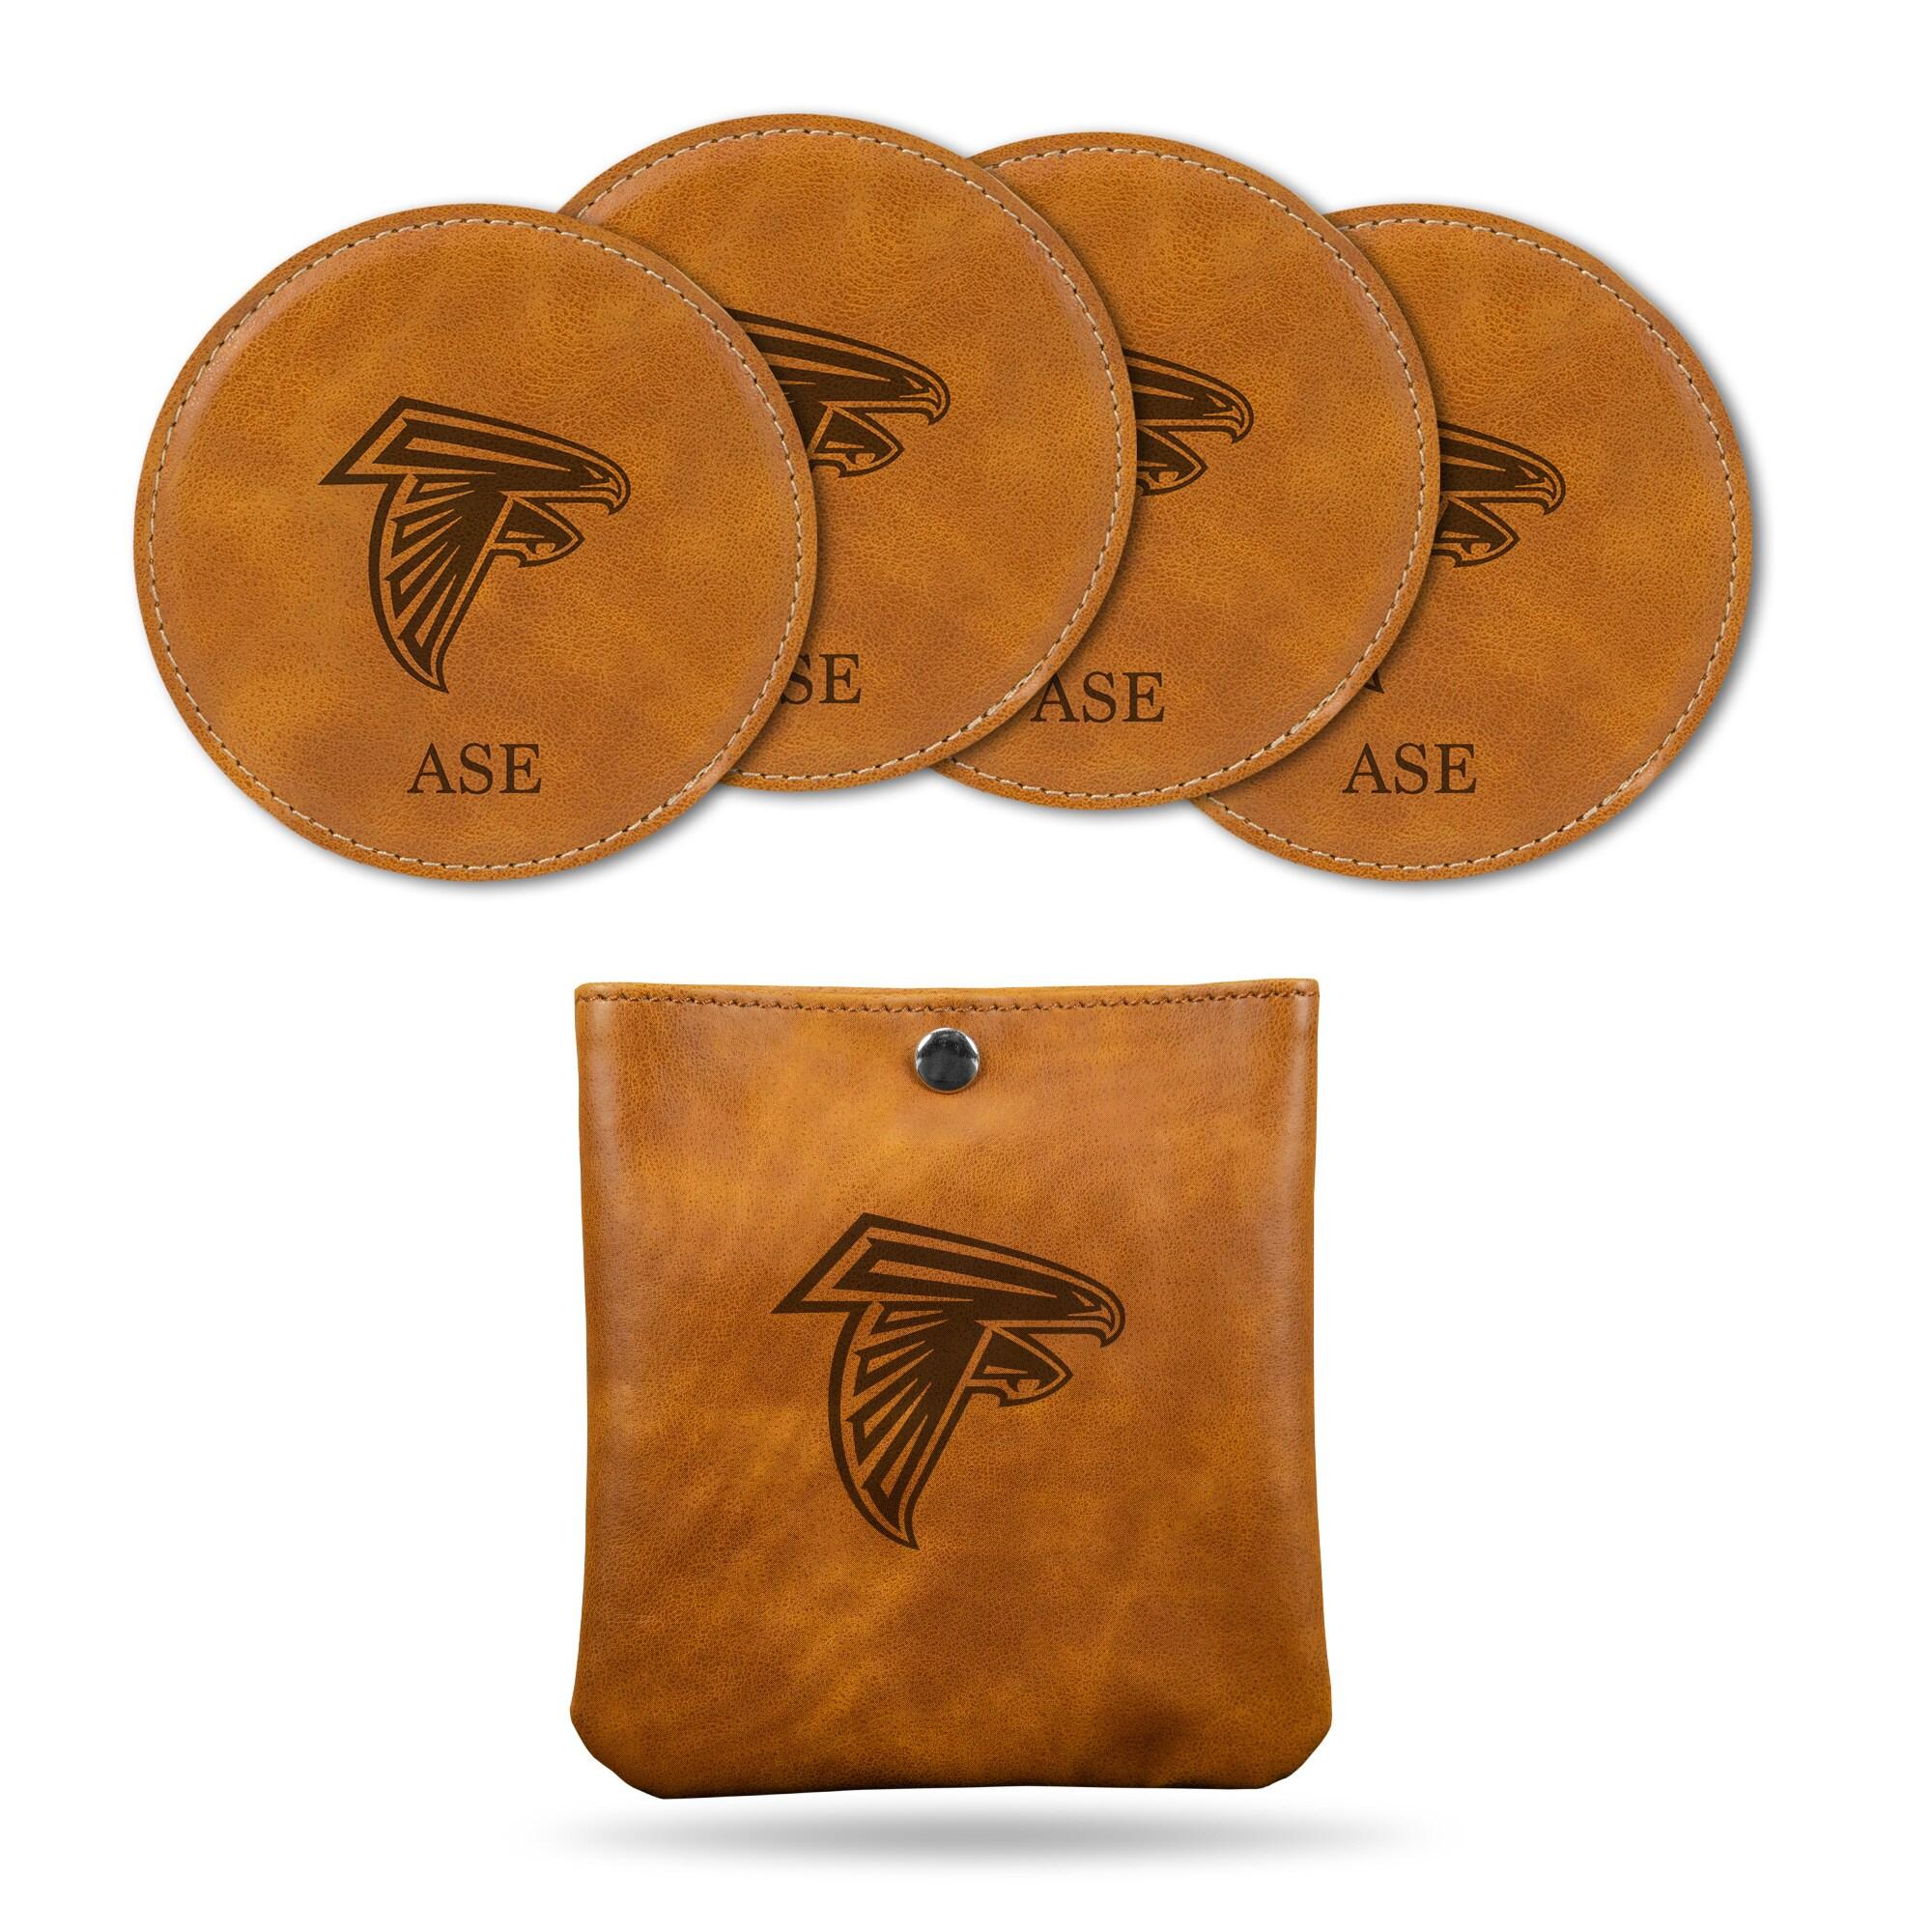 Atlanta Falcons Sparo 4-Pack Personalized Coaster Set - Brown